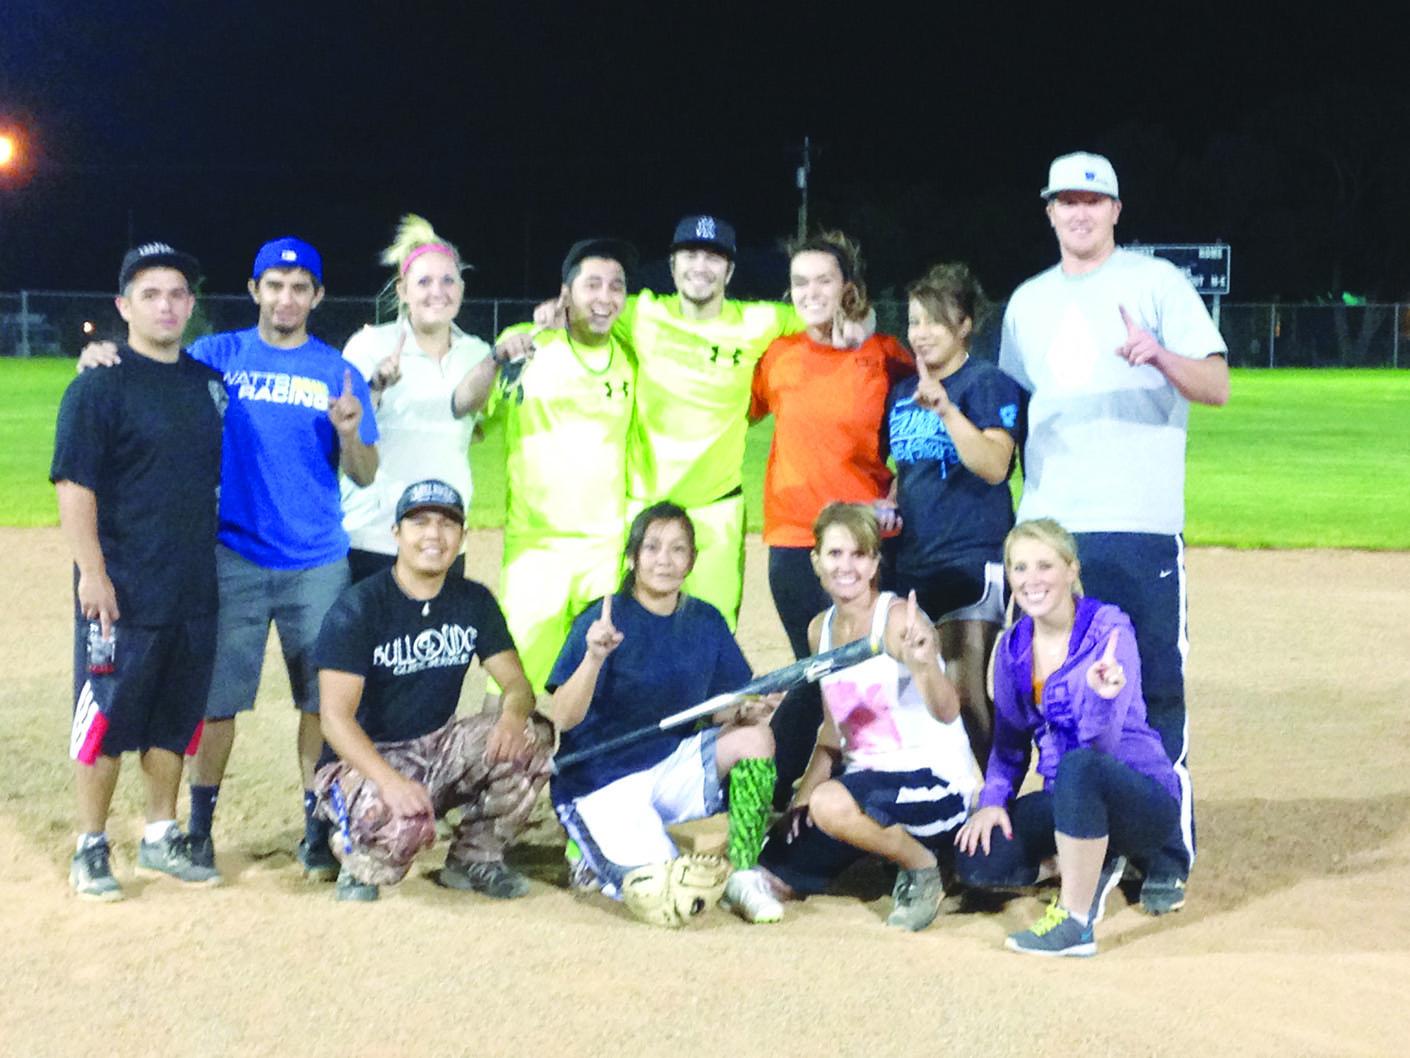 Ely Softball Champions